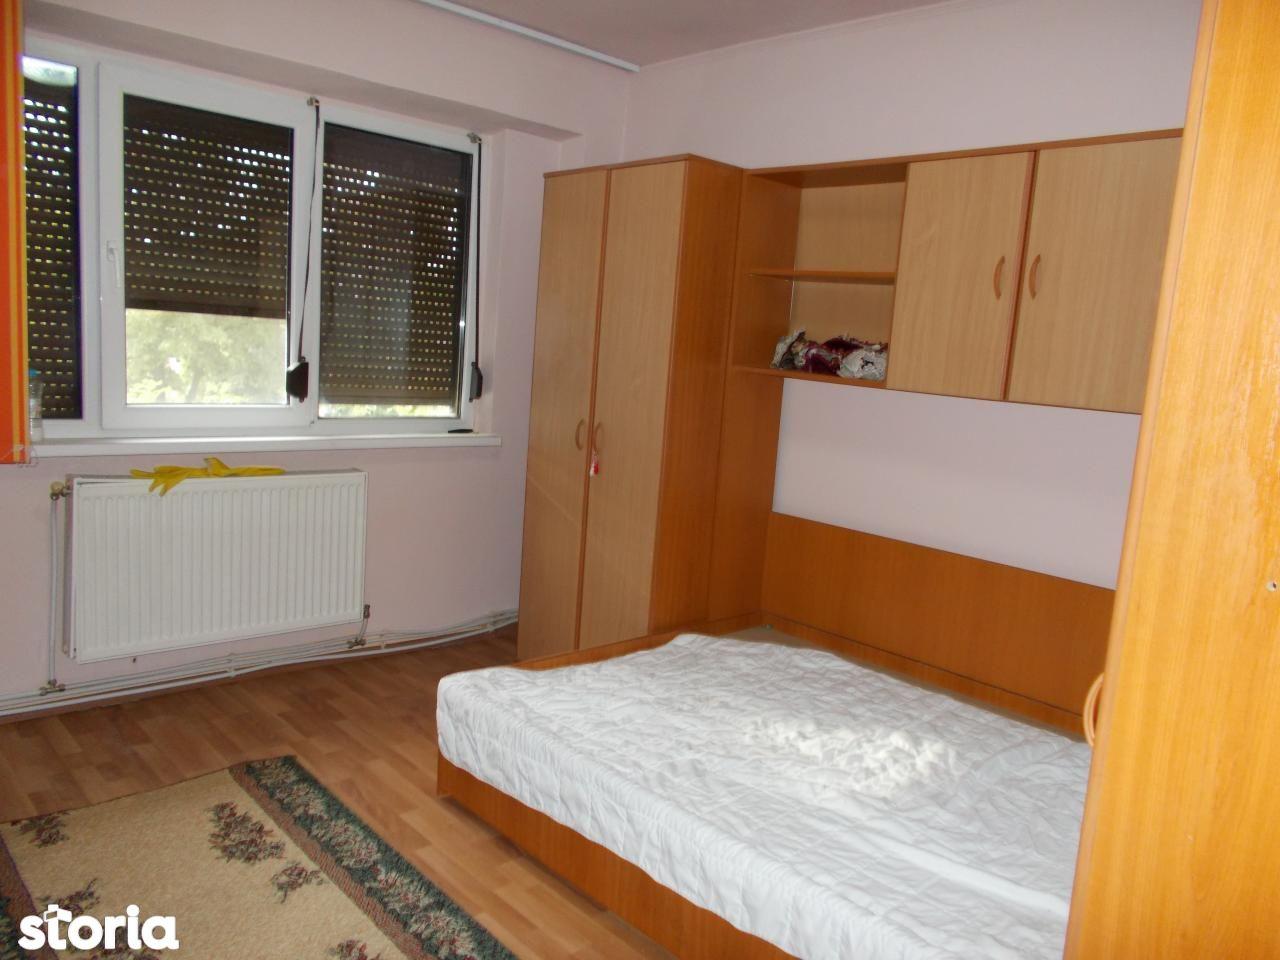 Apartament de vanzare, Braila, Viziru 3 - Foto 2